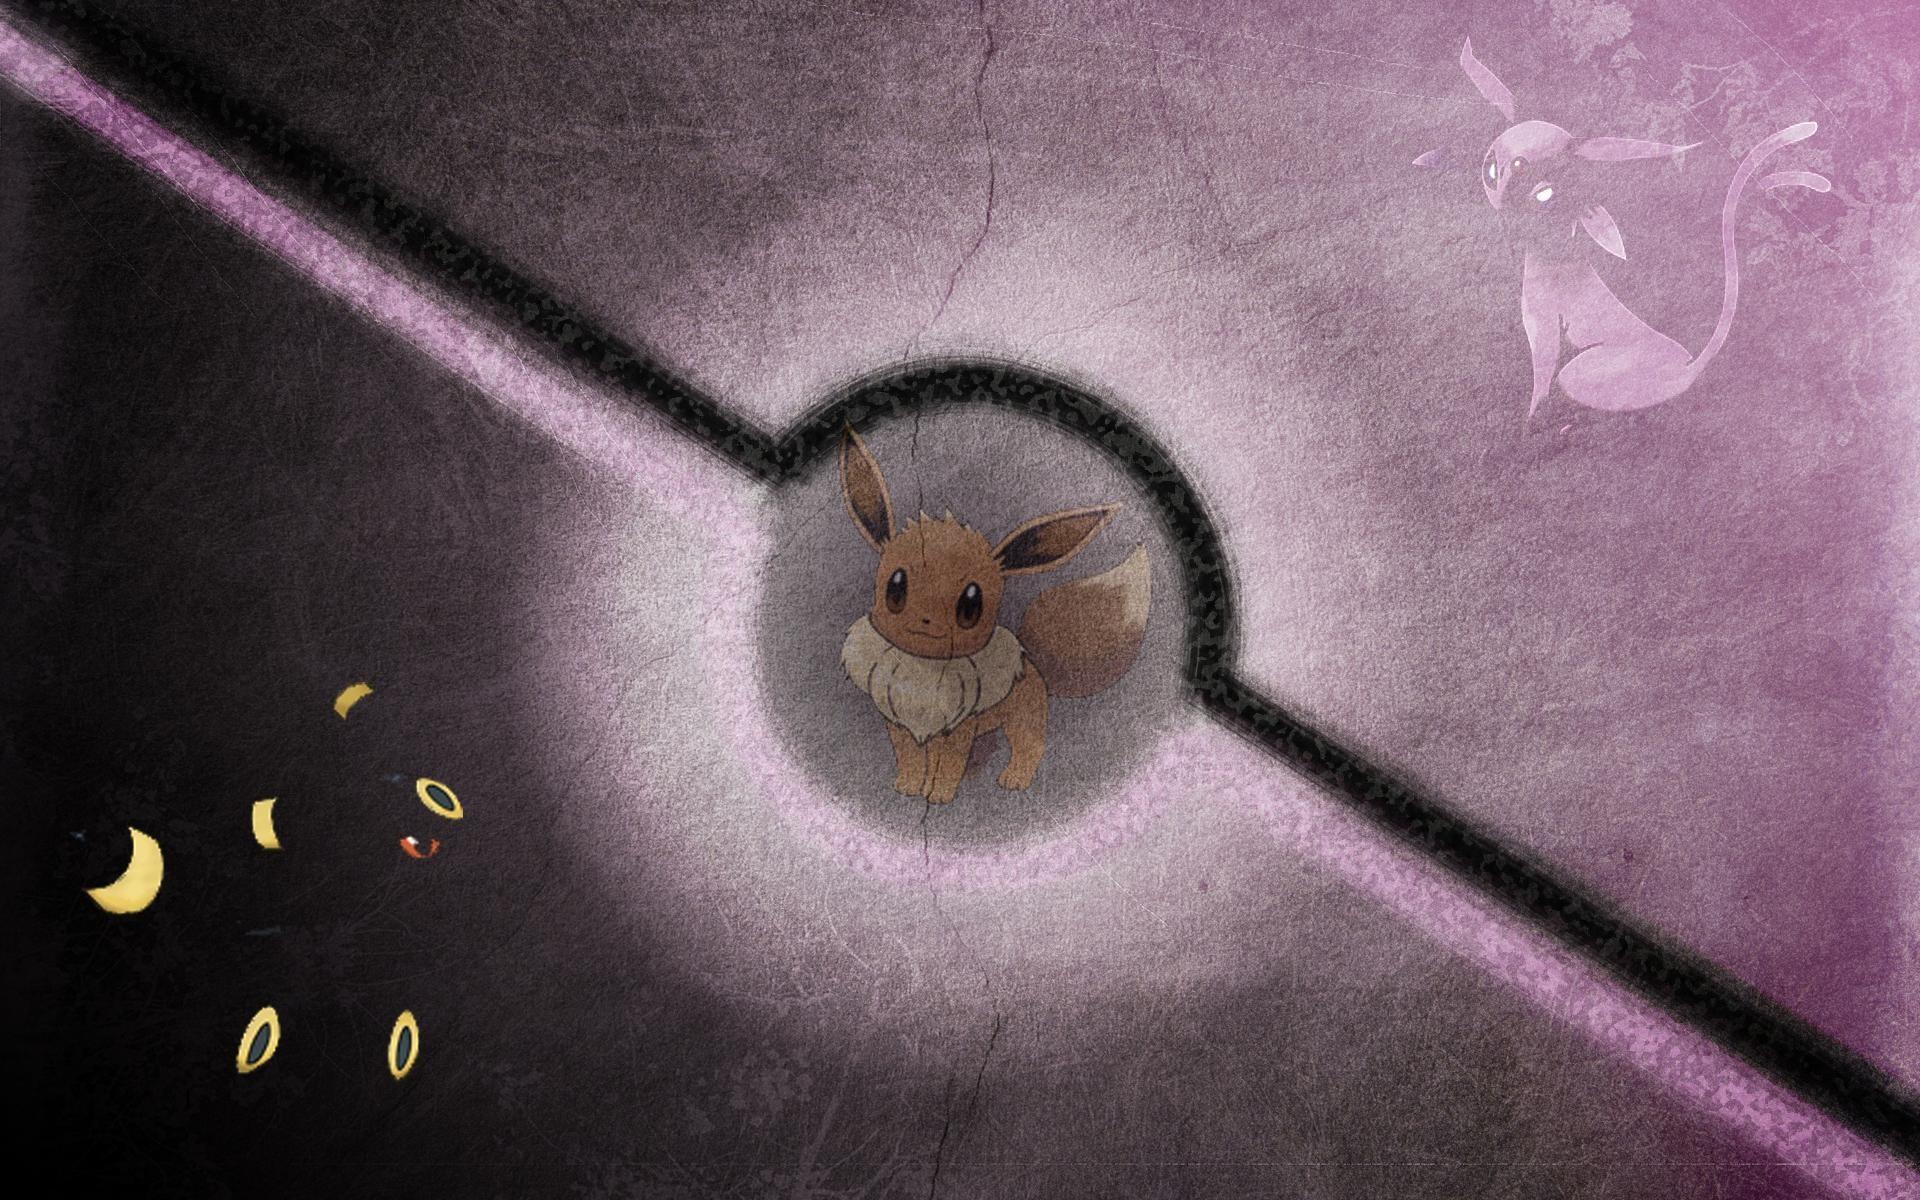 wallpaper.wiki-Pokemon-Phone-Eevee-HD-Image-PIC-